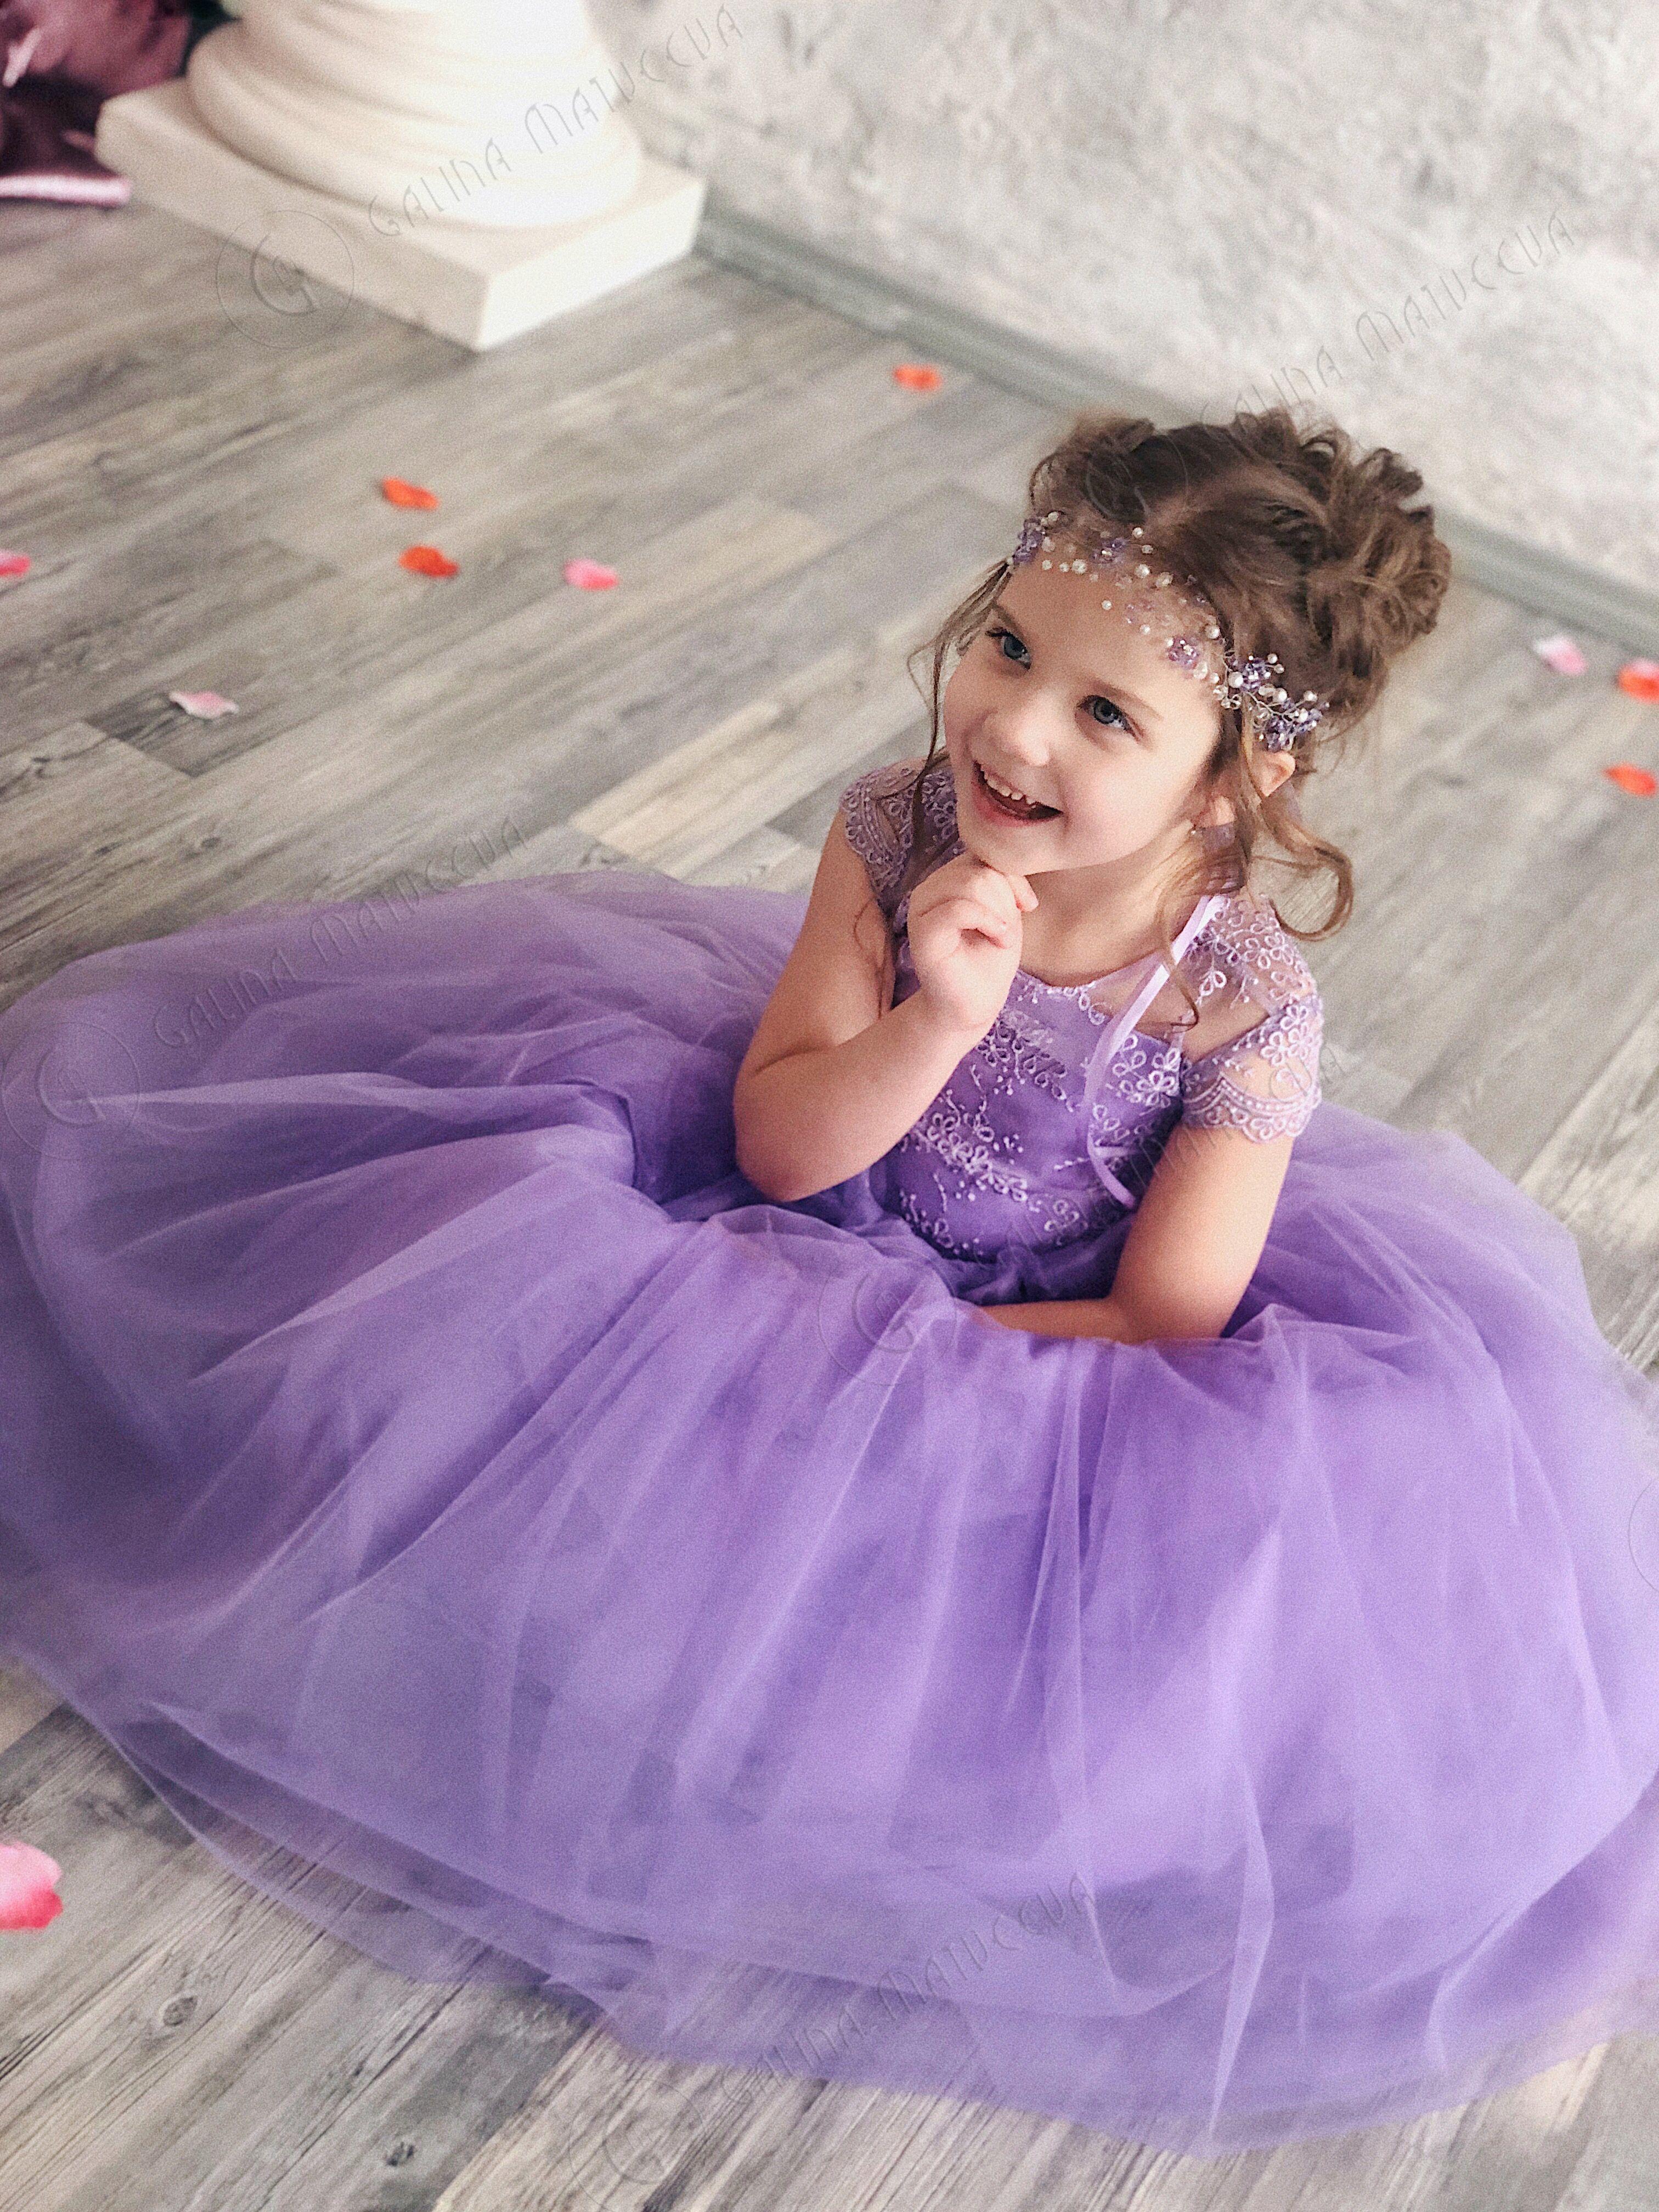 Lavender Flower Girl Dress Purple Tutu Dress Birthday Wedding Party Bridesmaid Holiday Purple Tulle Lace Flower Girl Dress Purple Tutu Dress Purple Flower Girl Dress Lavender Flower Girl Dress Purple Girls [ 4032 x 3024 Pixel ]